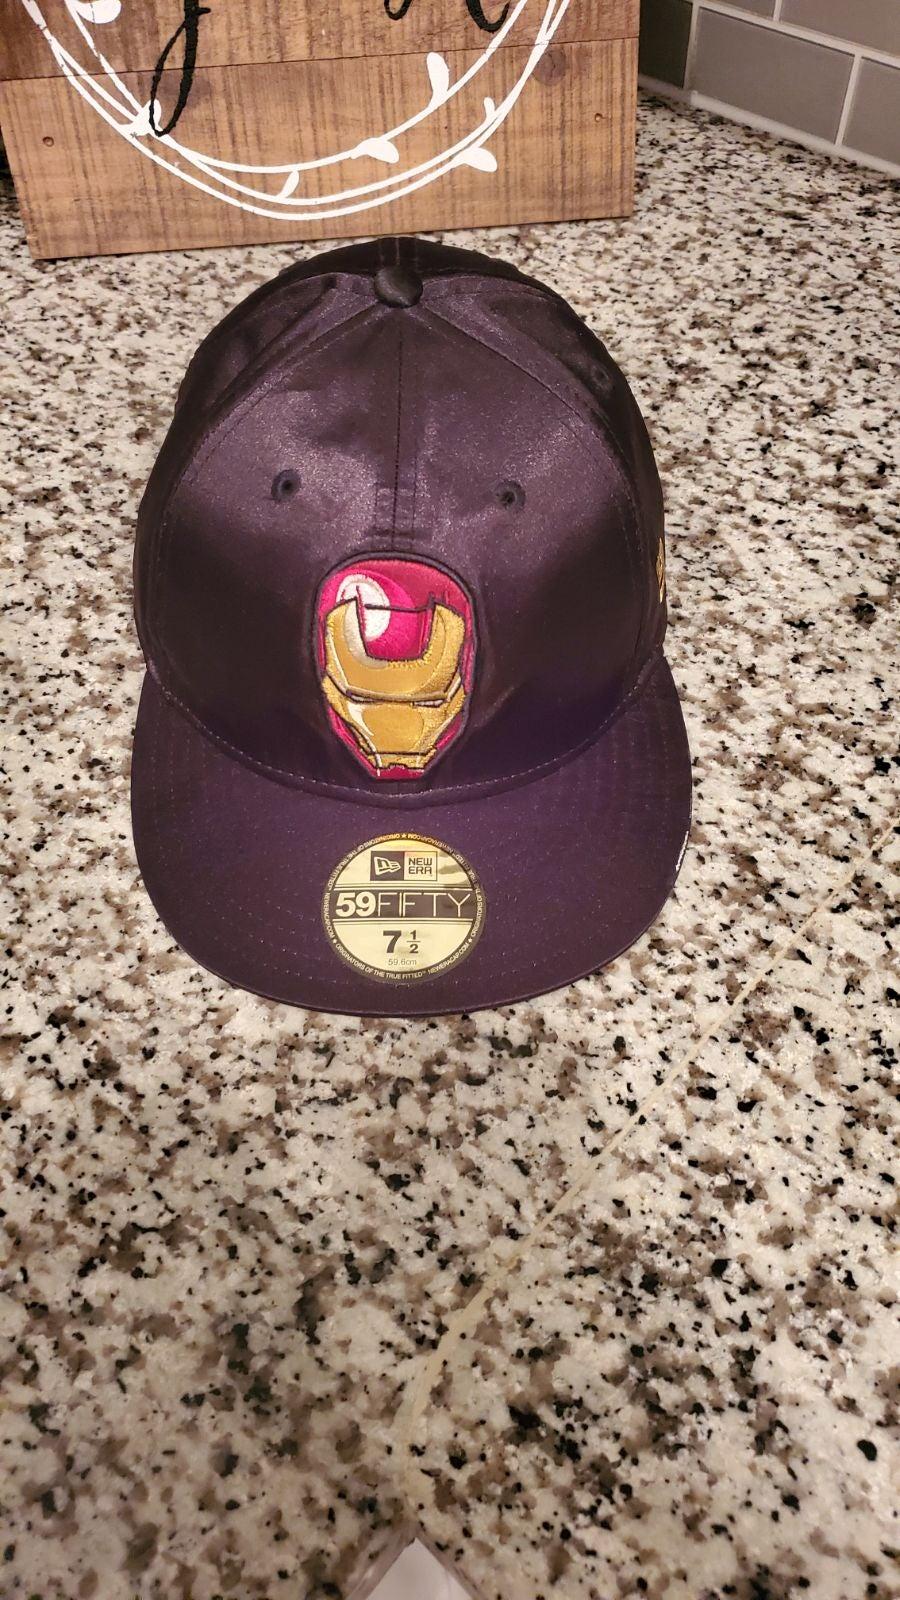 Iron Man new era hat 7 1/2